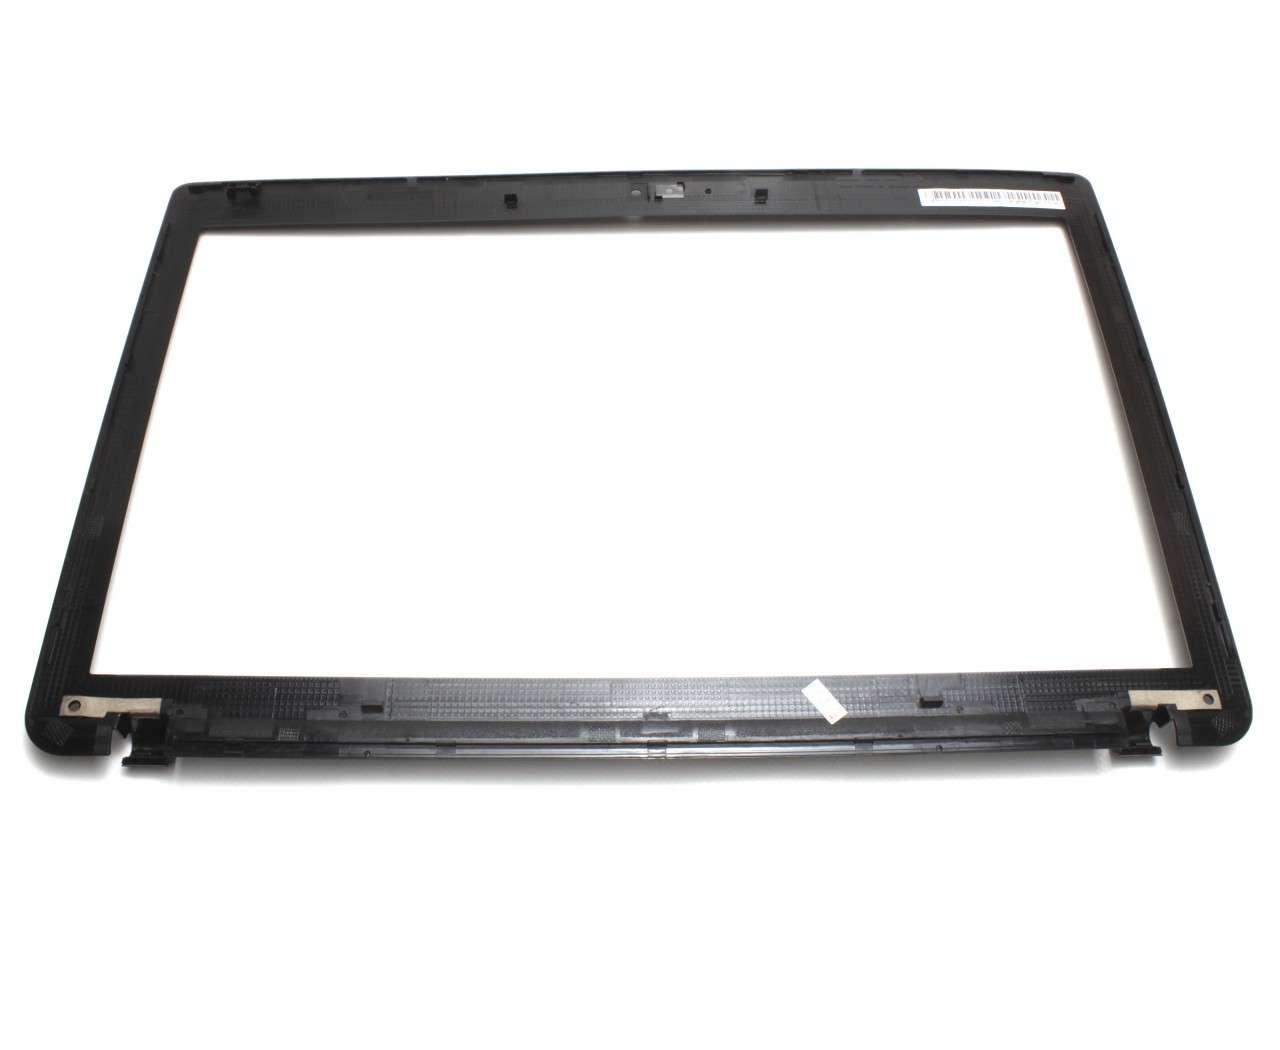 Rama Display Toshiba AP0OT000B00 Bezel Front Cover Neagra imagine powerlaptop.ro 2021